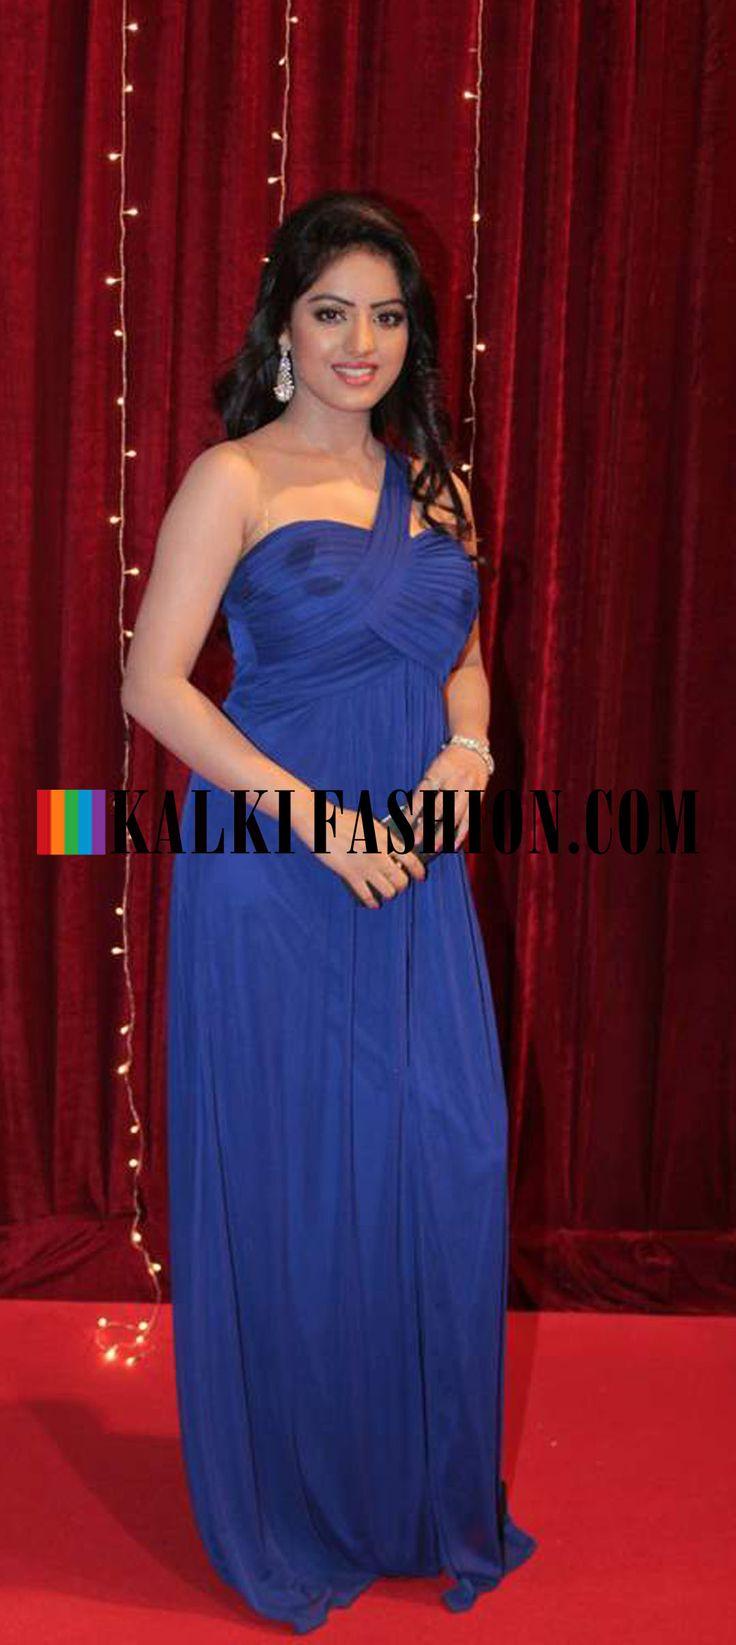 Deepika singh nude images-2875